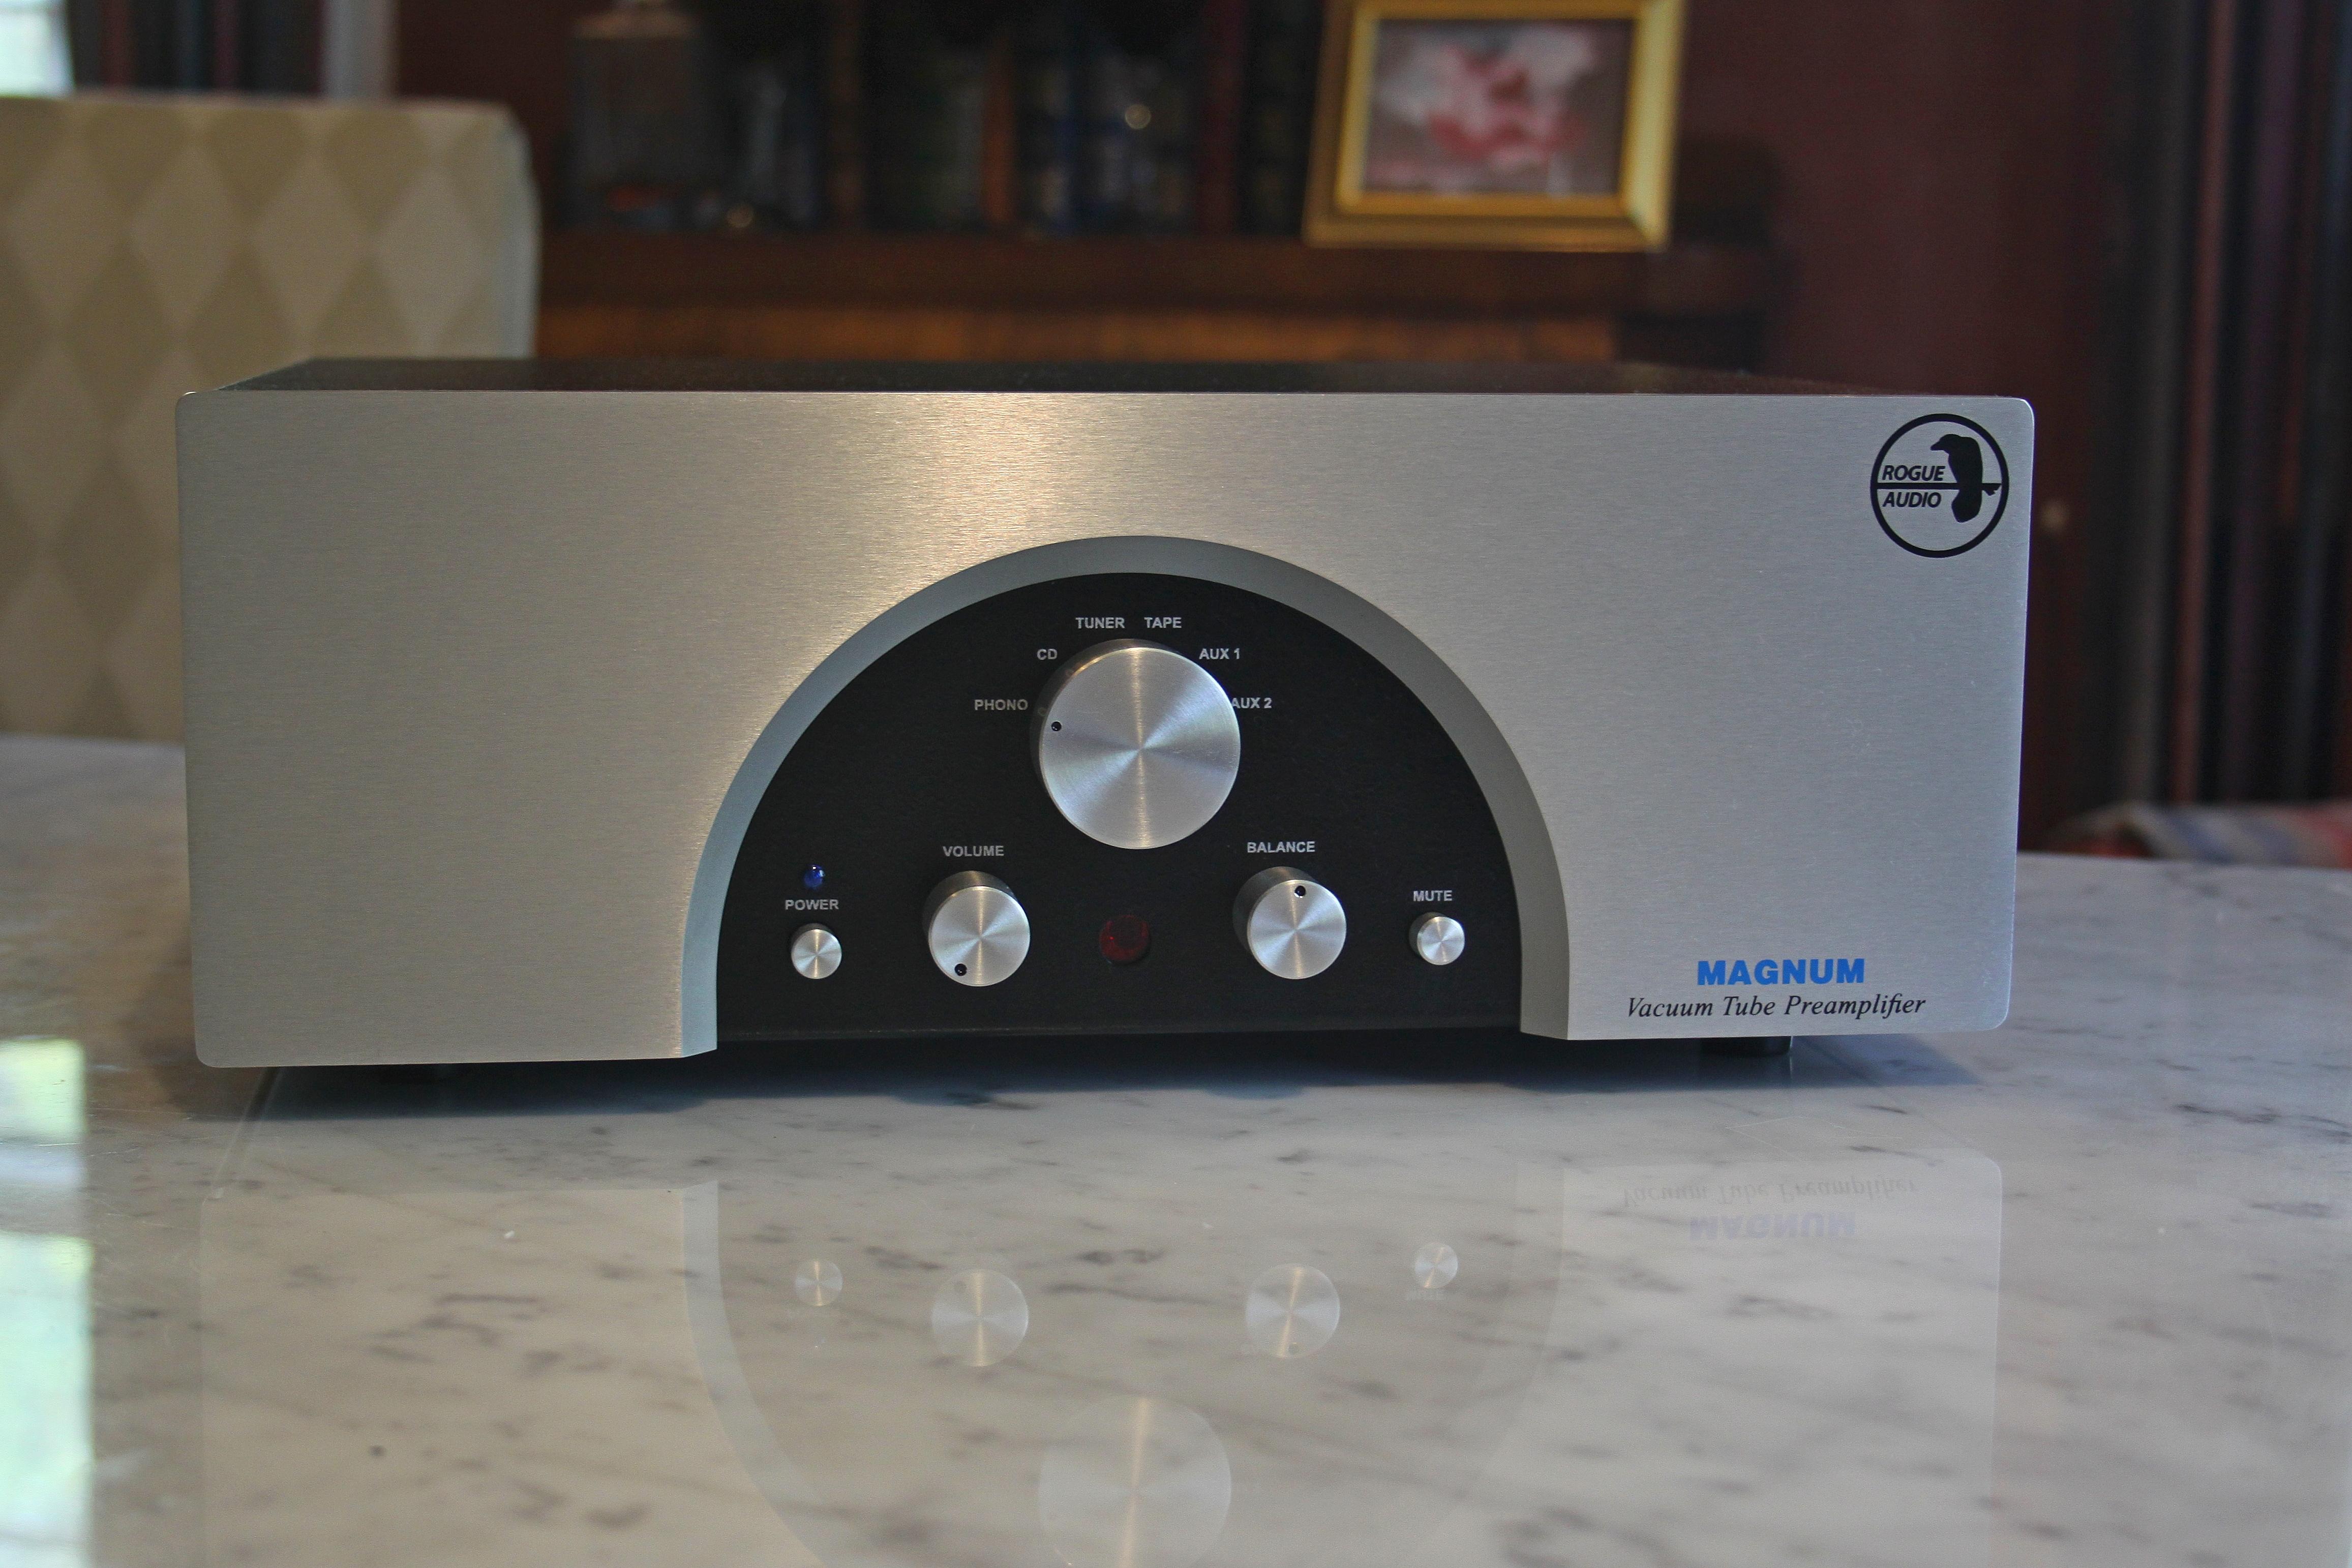 fs rogue audio magnum 66 tube preamp polk audio. Black Bedroom Furniture Sets. Home Design Ideas